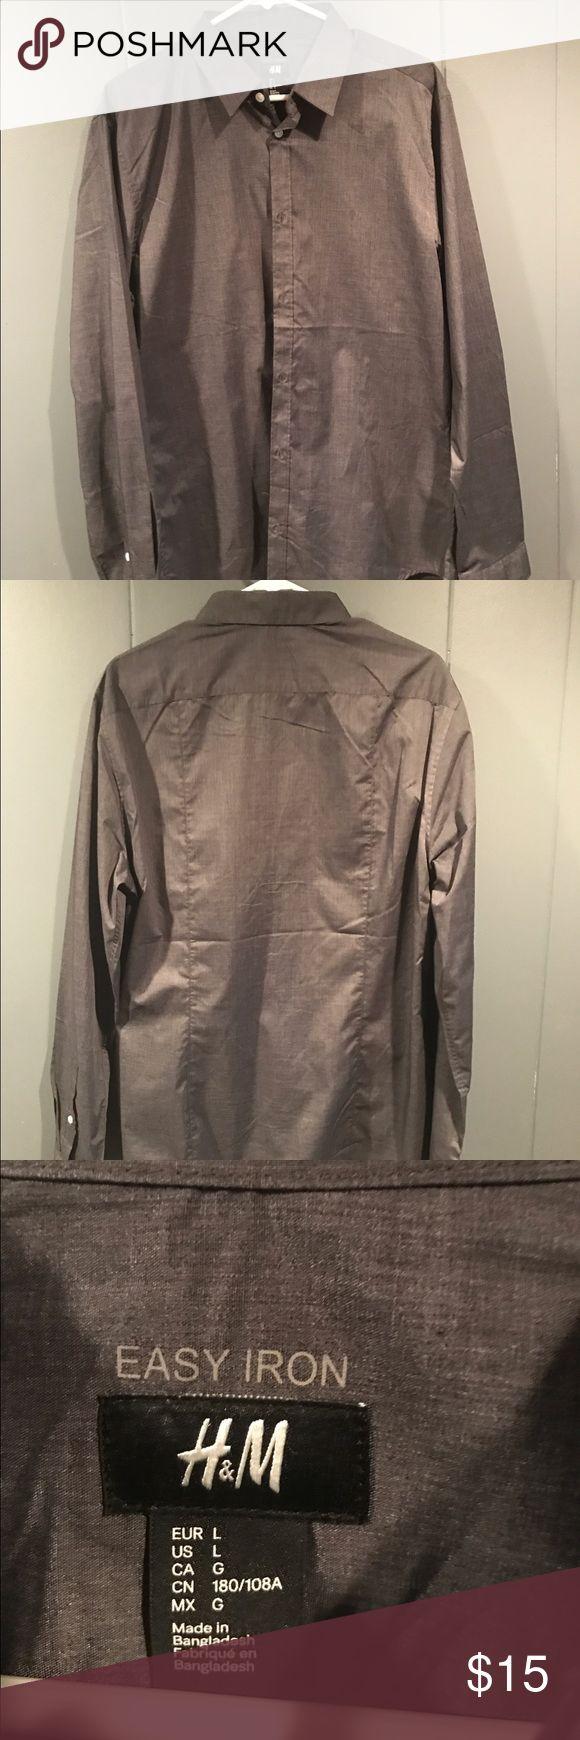 H&m Men's gray button down shirt by h&m H&M men's button down shirt Shirts Casual Button Down Shirts